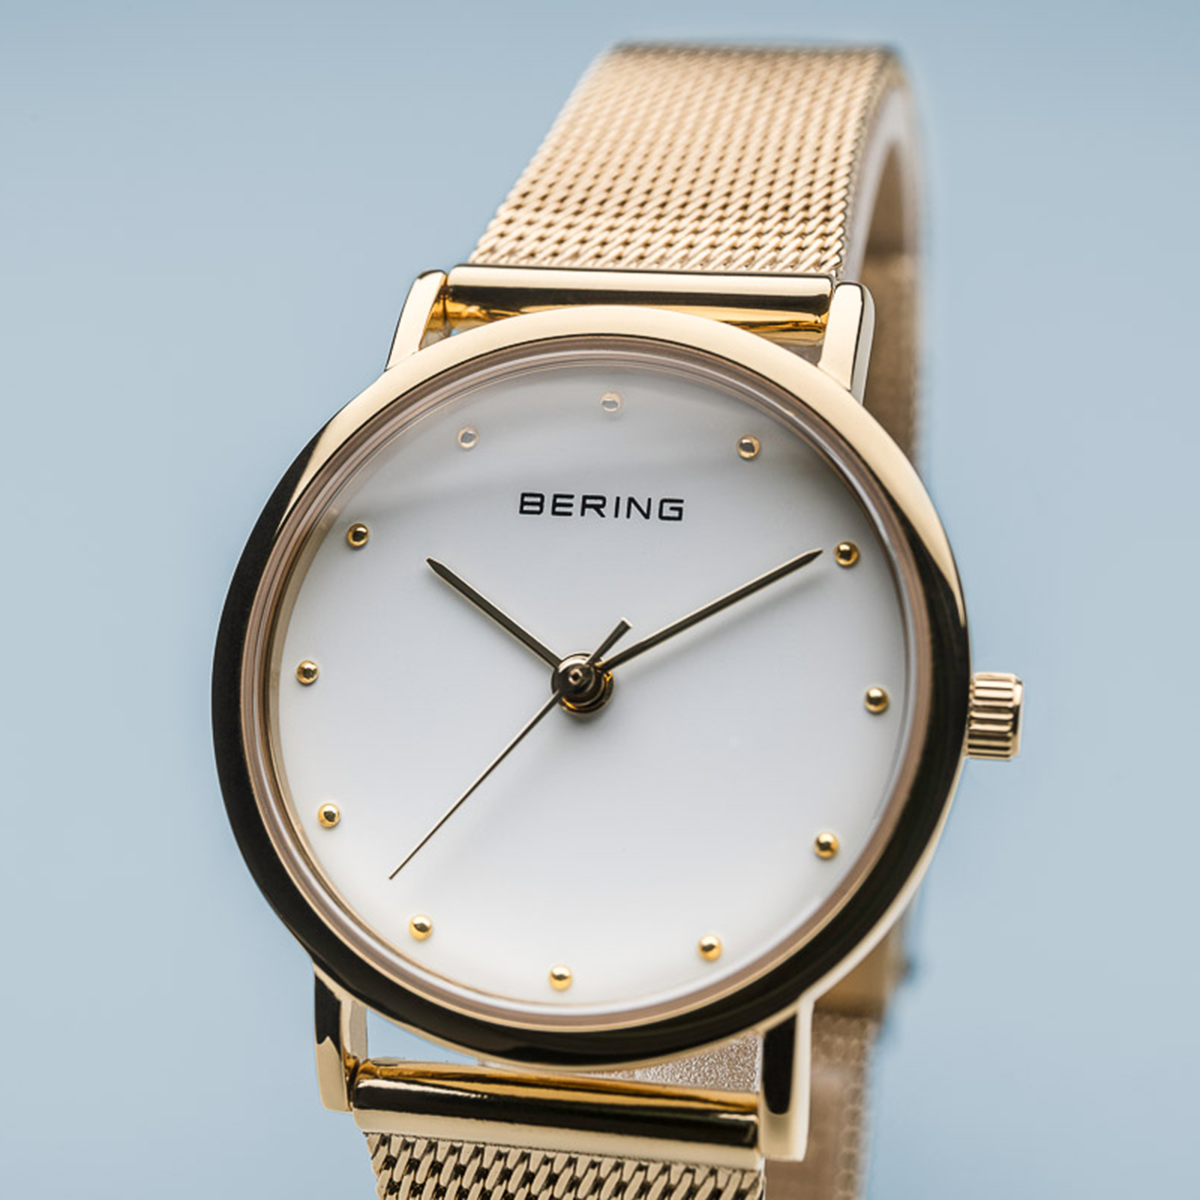 Zegarek damski Bering classic 13426-334 - duże 1